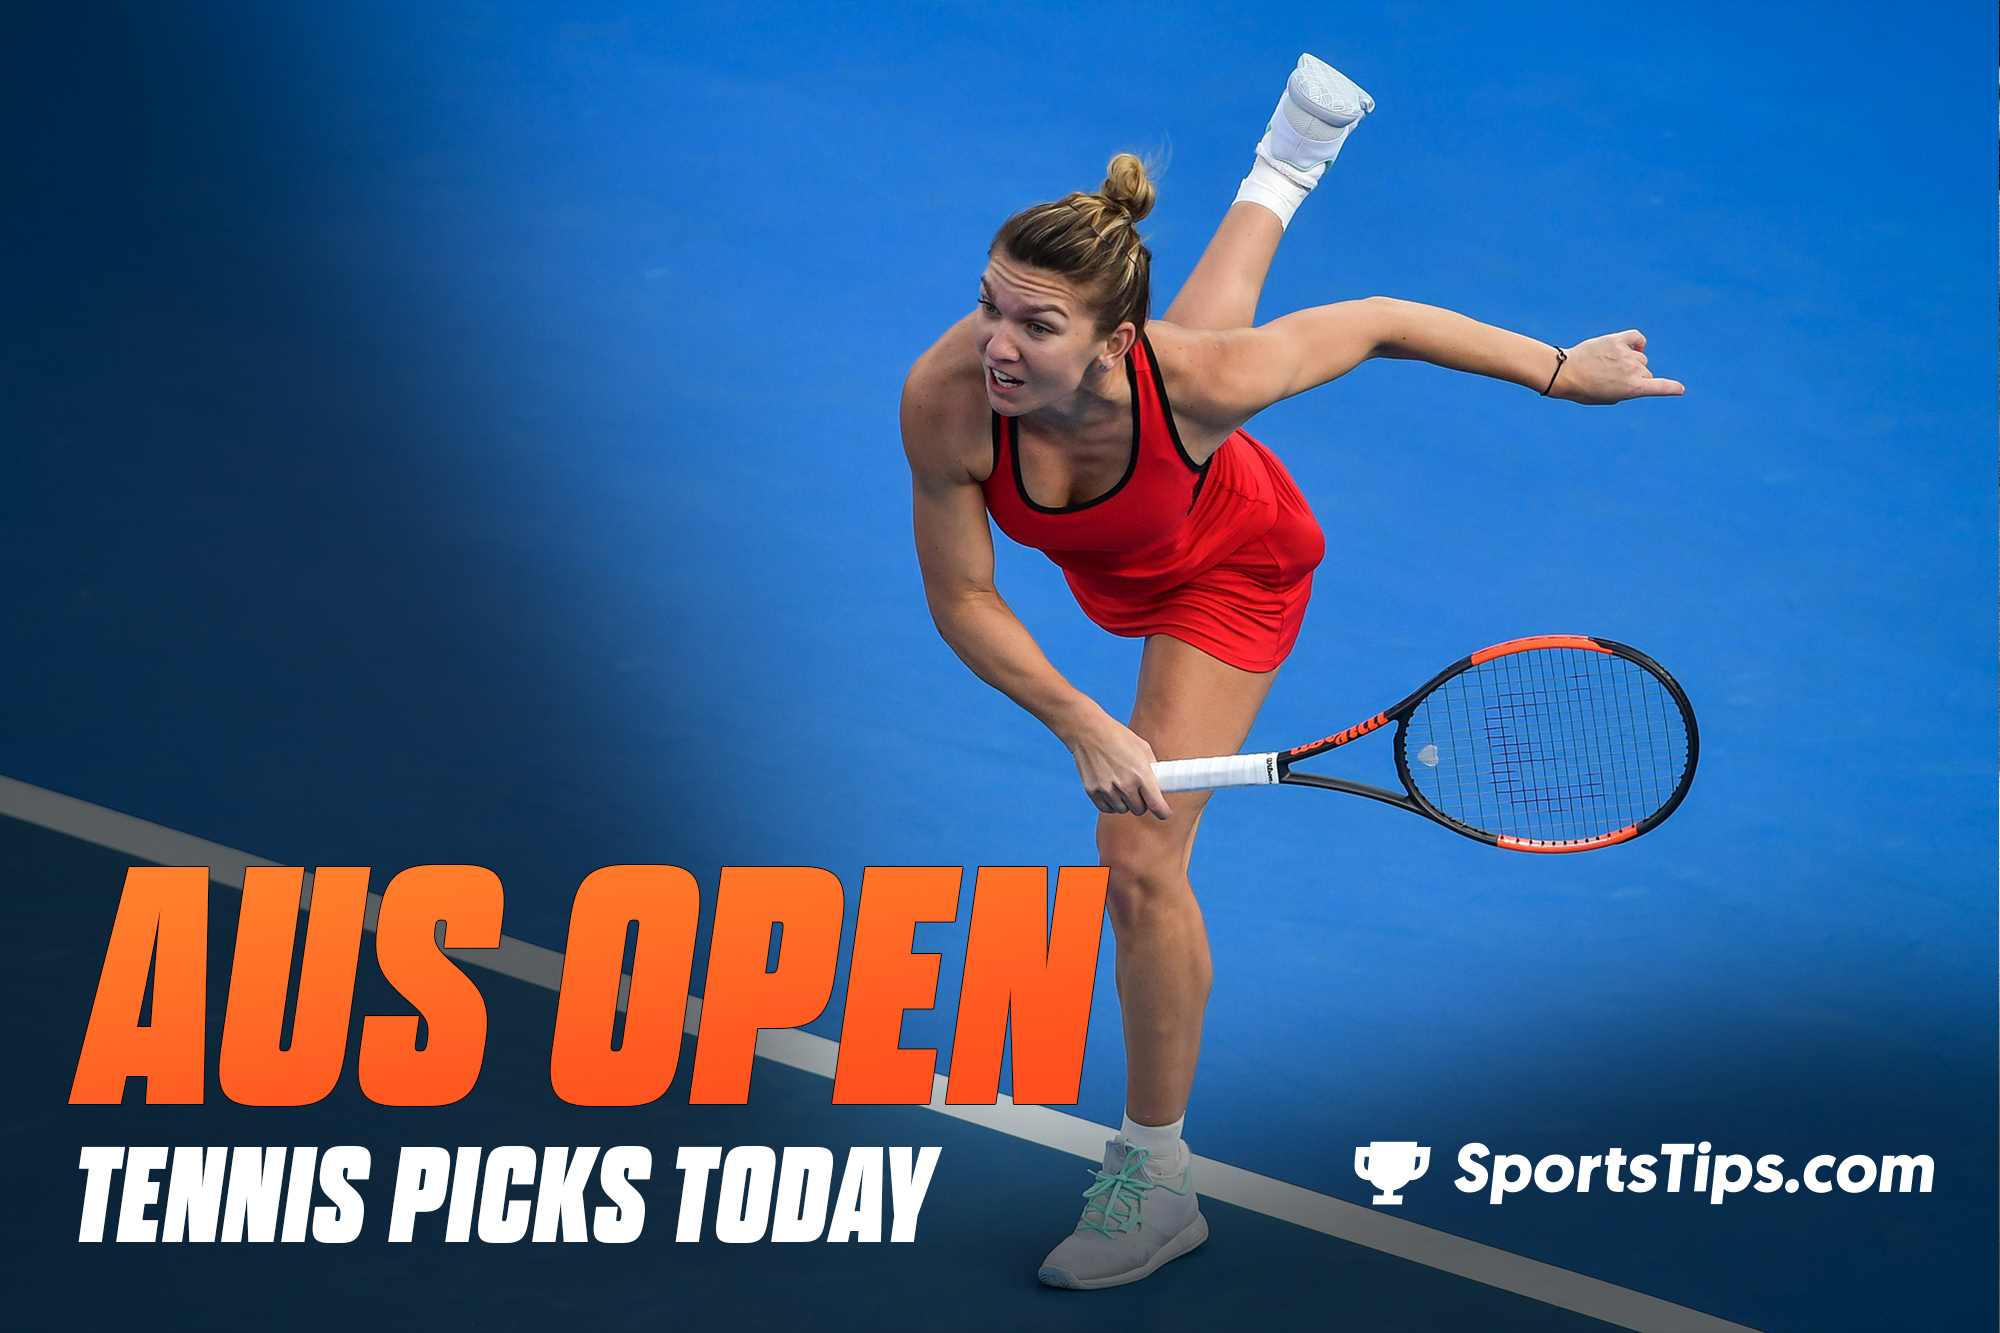 Tennis Predictions Today For The Australian Open – Women's Quarter-Finals 2021